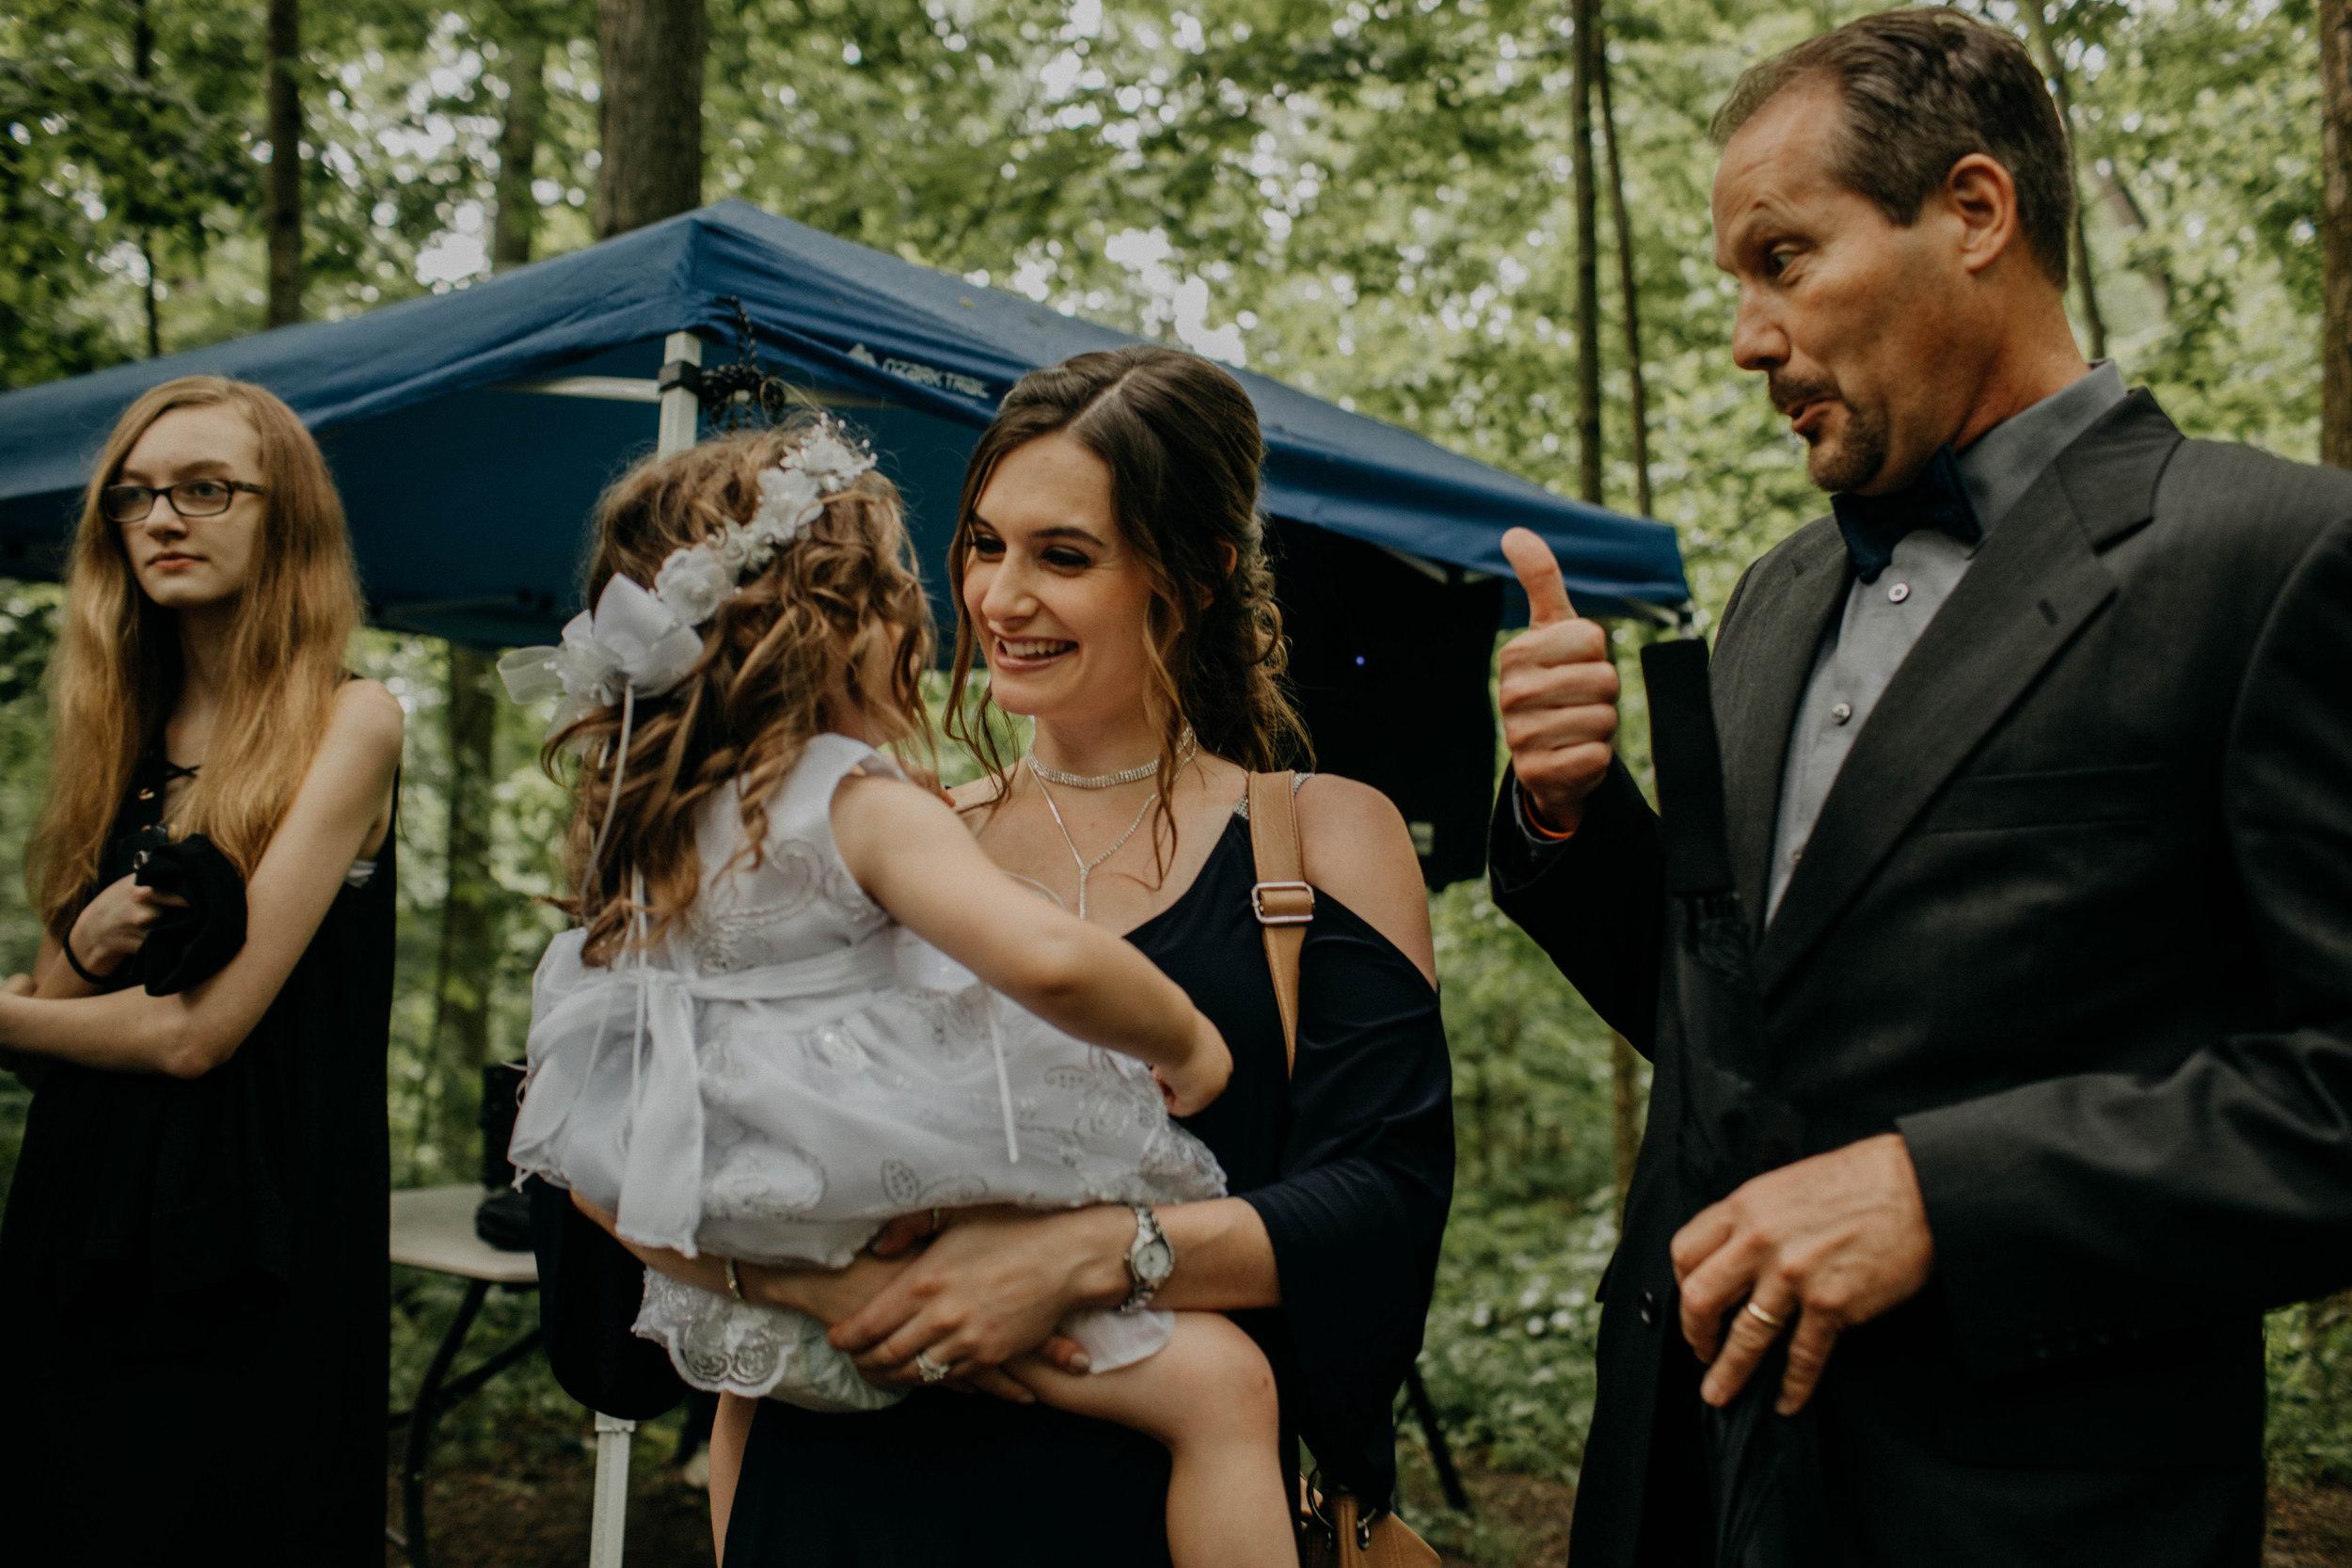 Columbus ohio wedding photographer canyon run ranch wedding grace e jones photography wedding photographer79.jpg